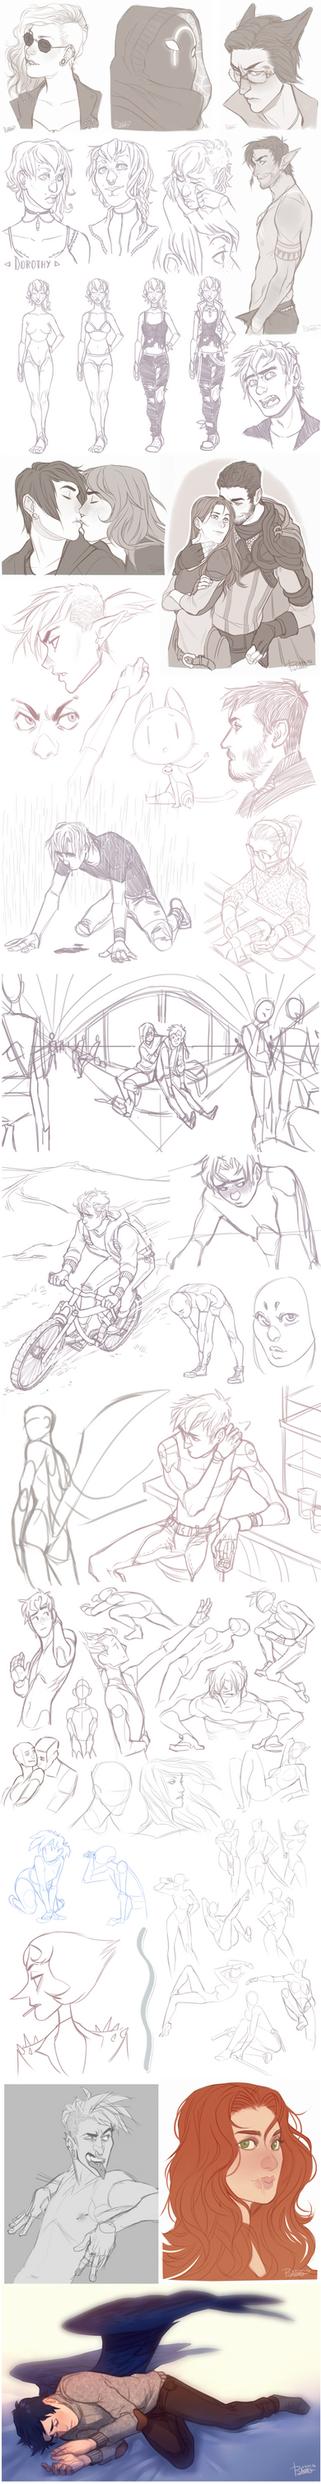 Sketch Dump 14 by GoldenTar